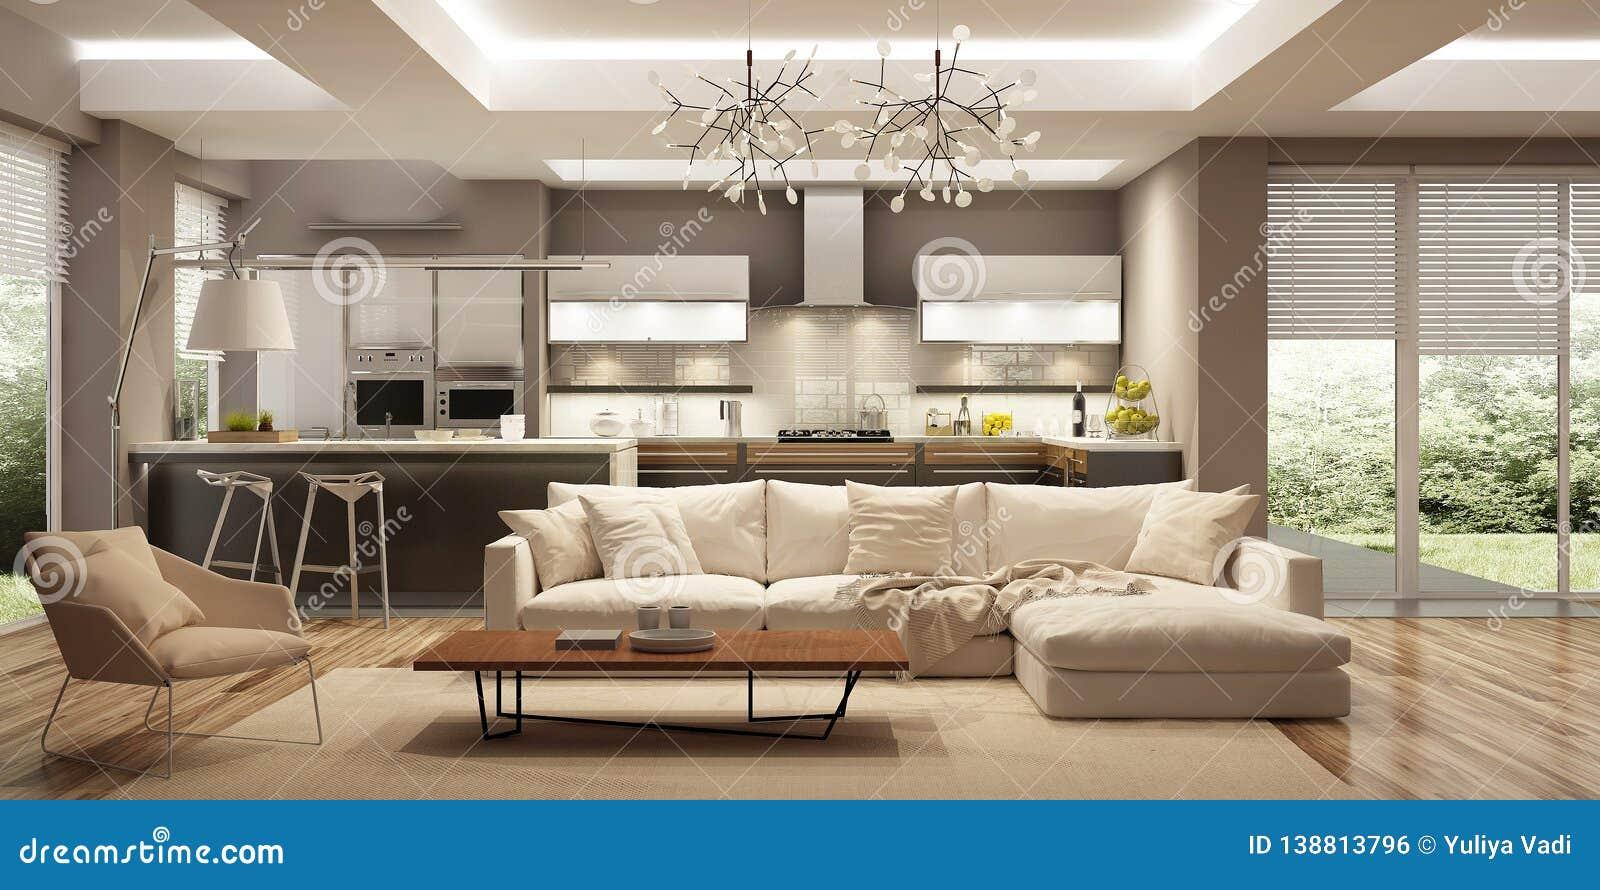 Modern House Interior In Scandinavian Style 3d Rendering